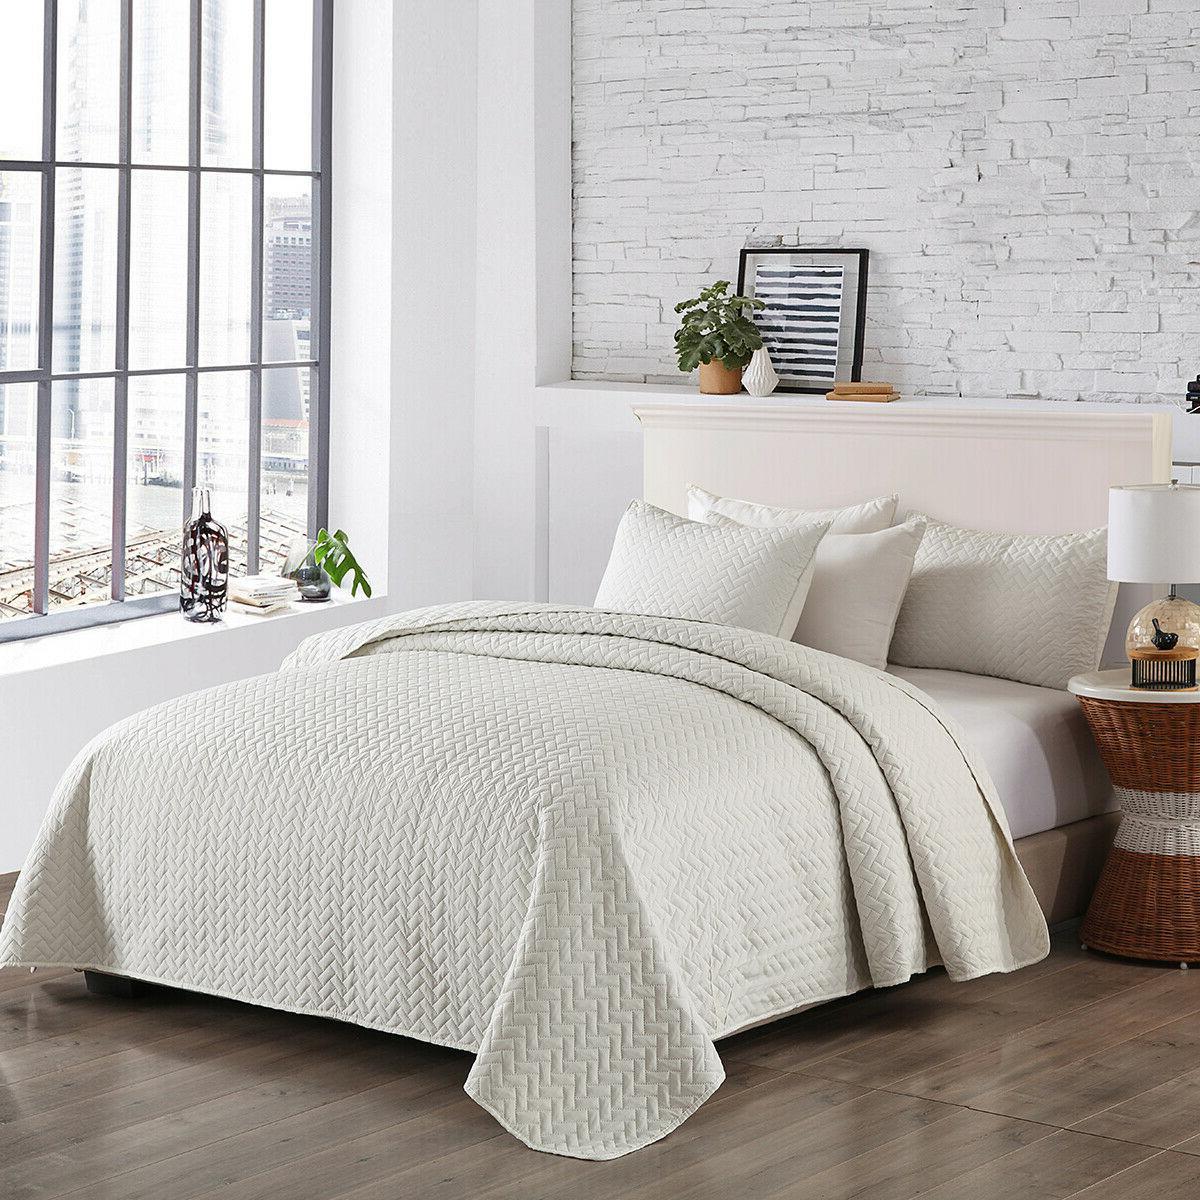 3-Piece Bedspread Coverlet Set Quilt Set Solid Color Queen/K